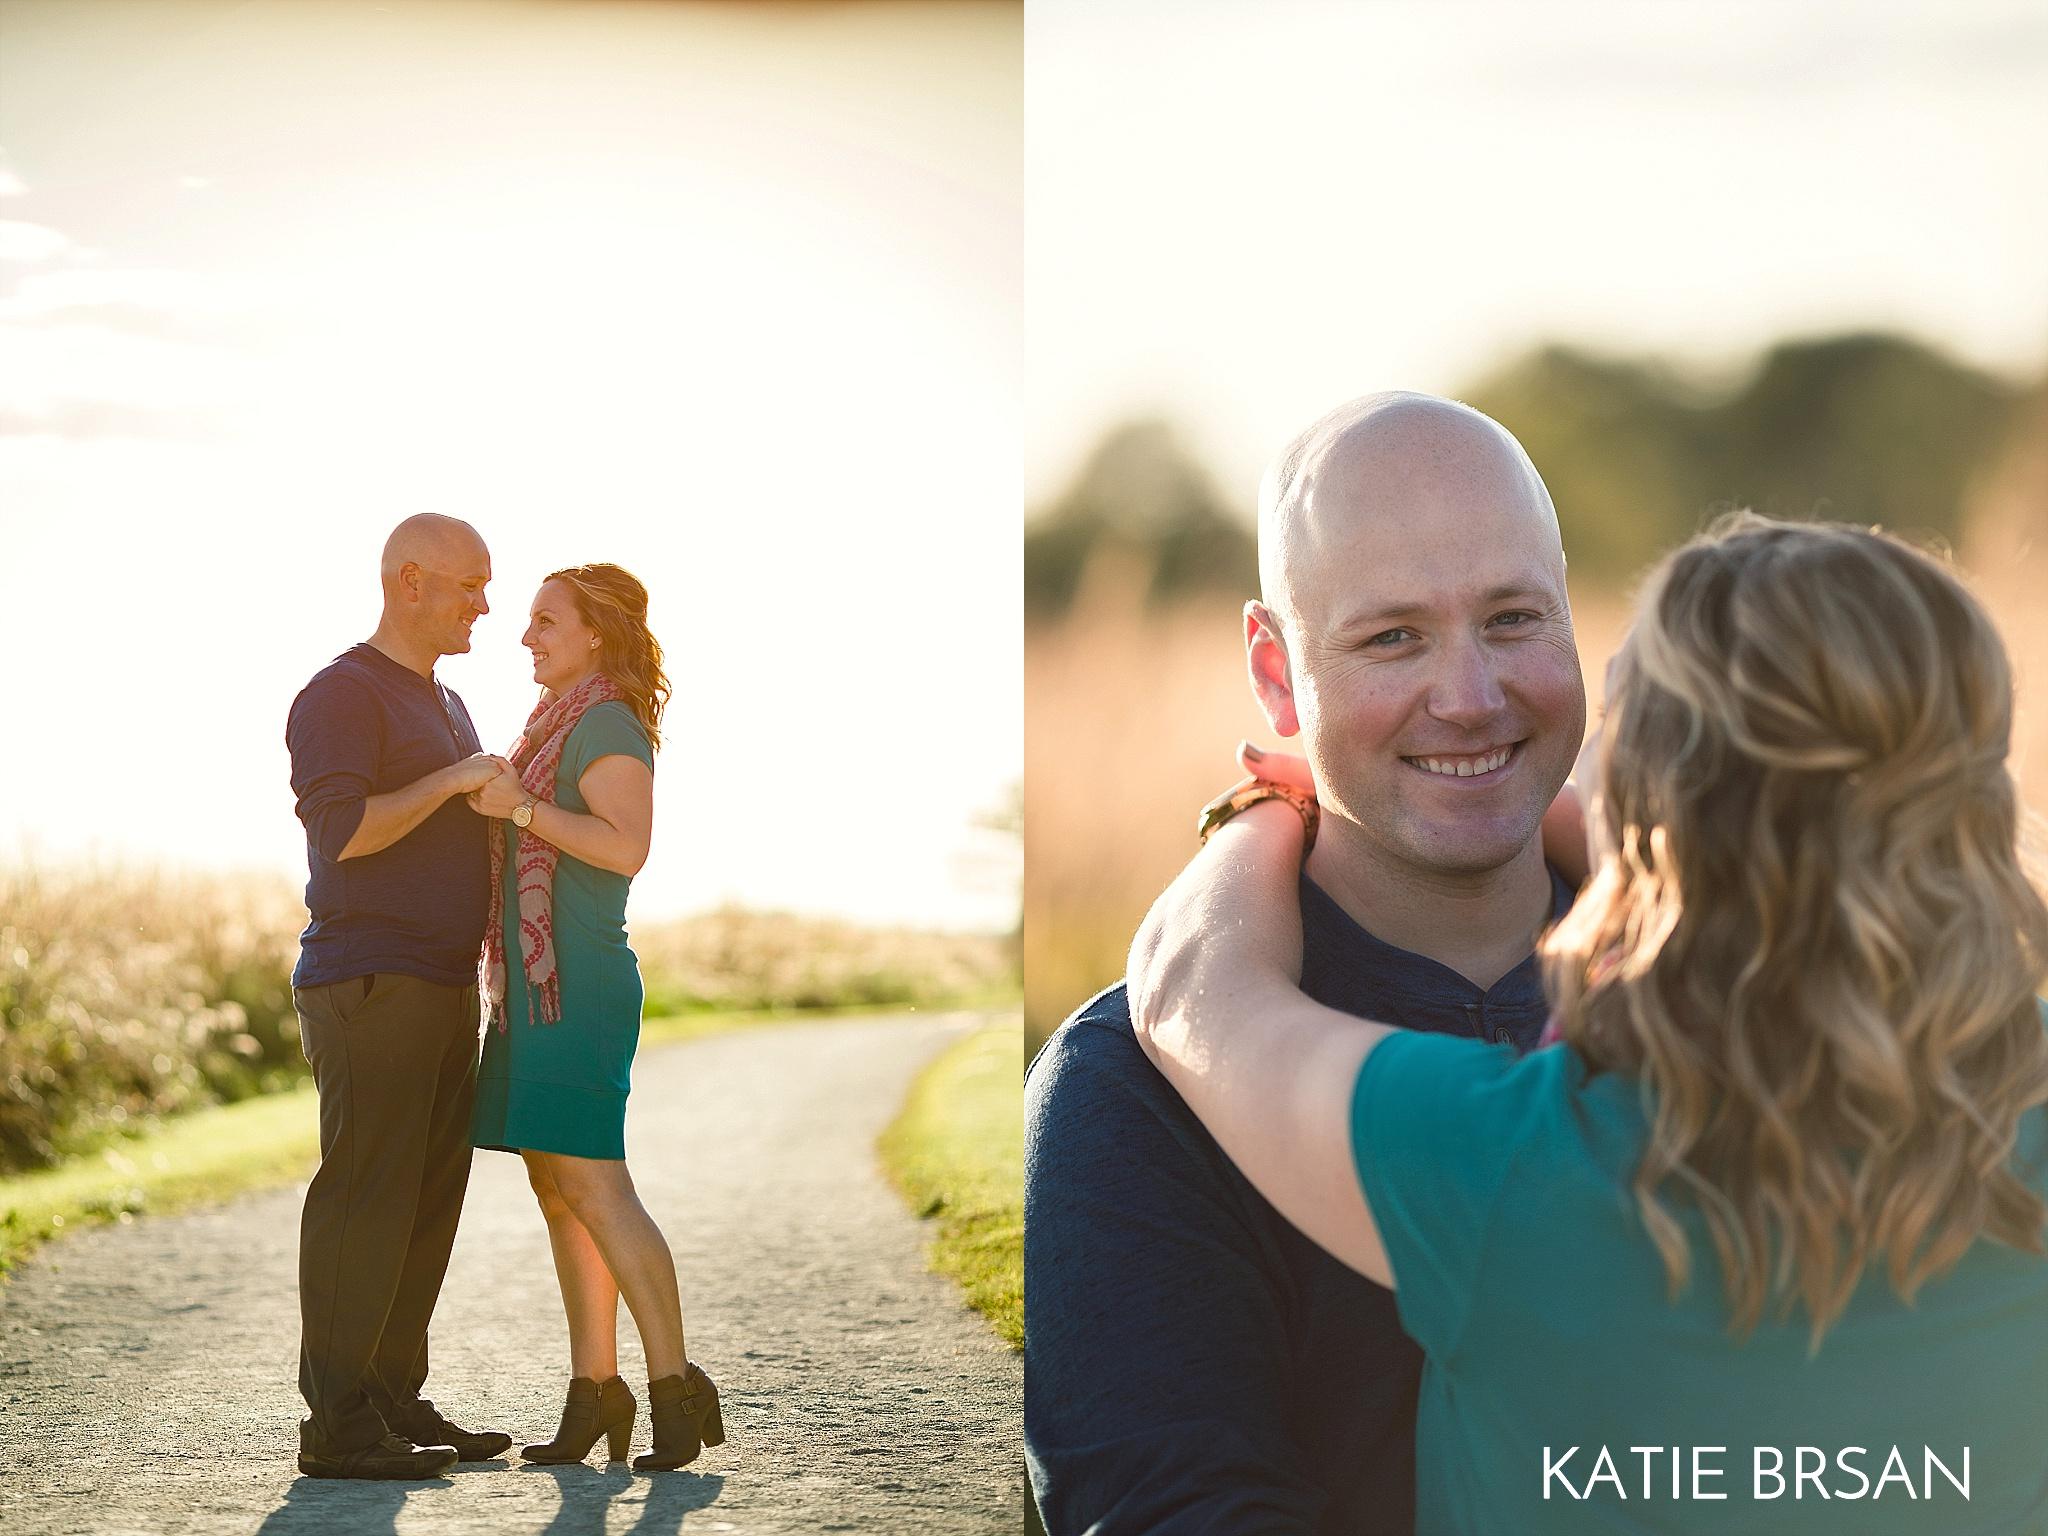 KatieBrsan-Chicago-Suburban-EngagementPictures-HadlyValley_0577.jpg